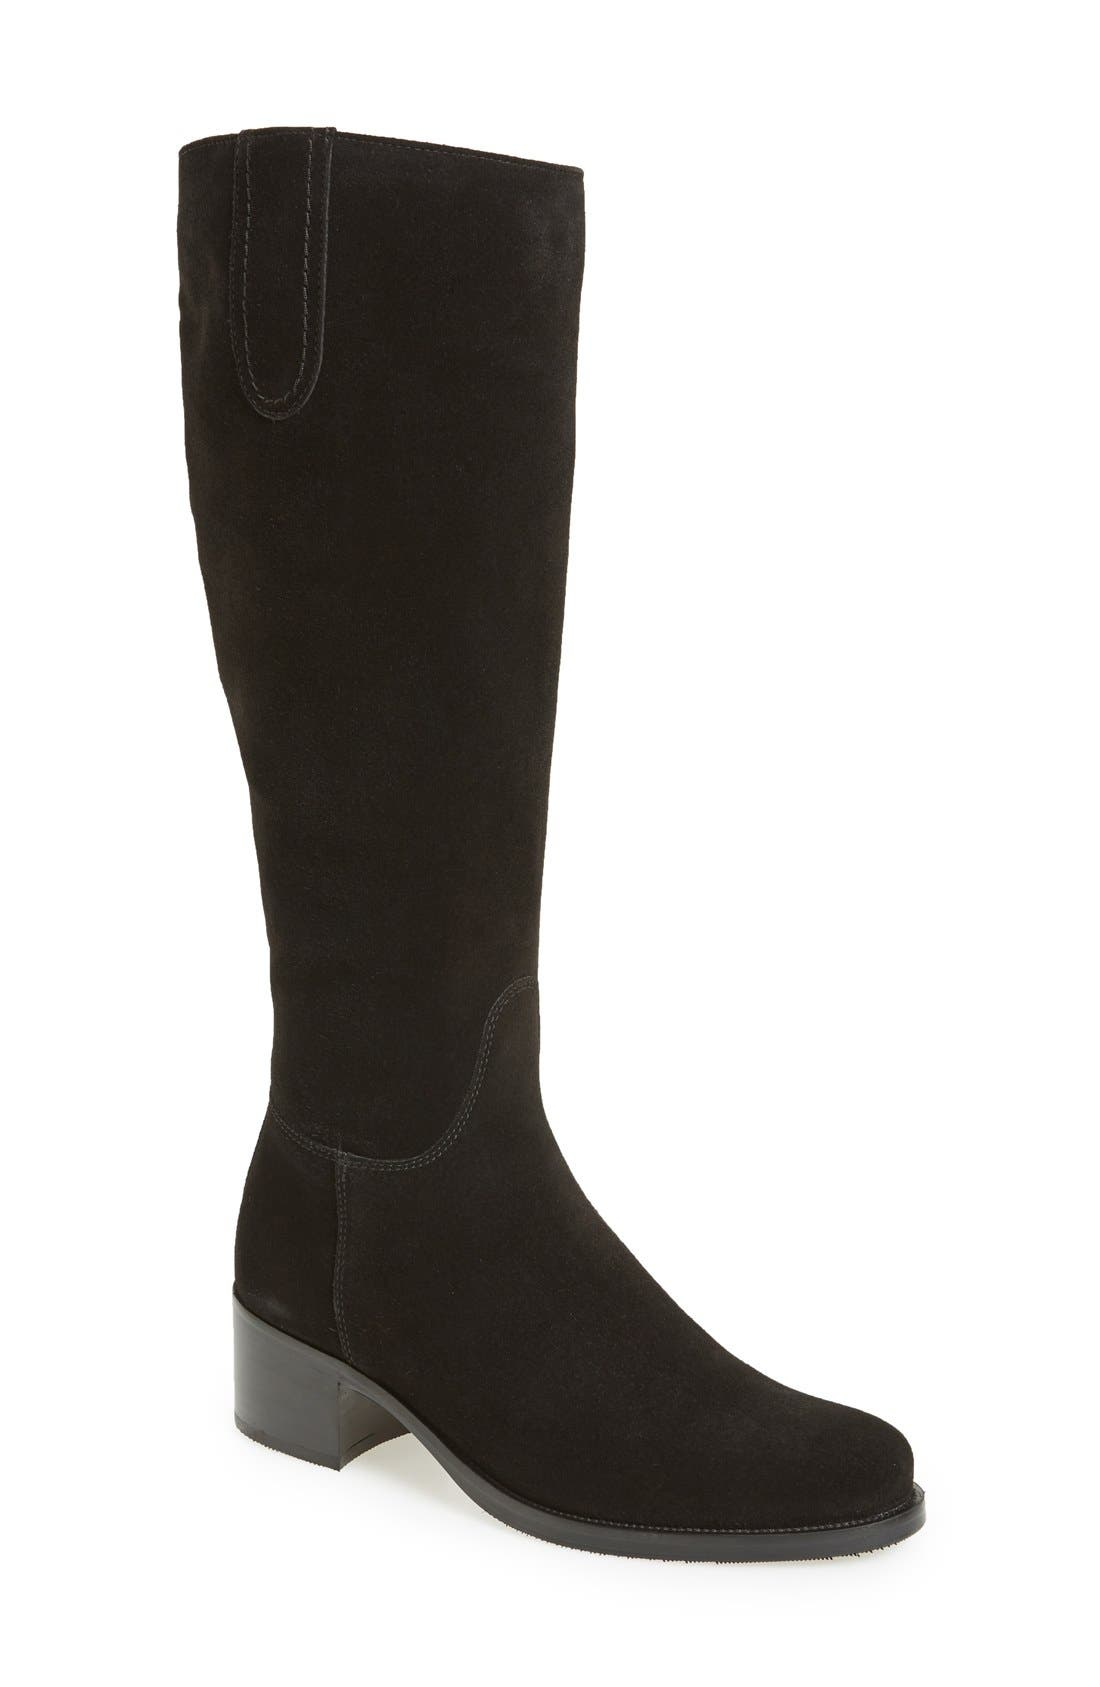 LA CANADIENNE 'Polly' Waterproof Knee High Boot, Main, color, BLACK SUEDE